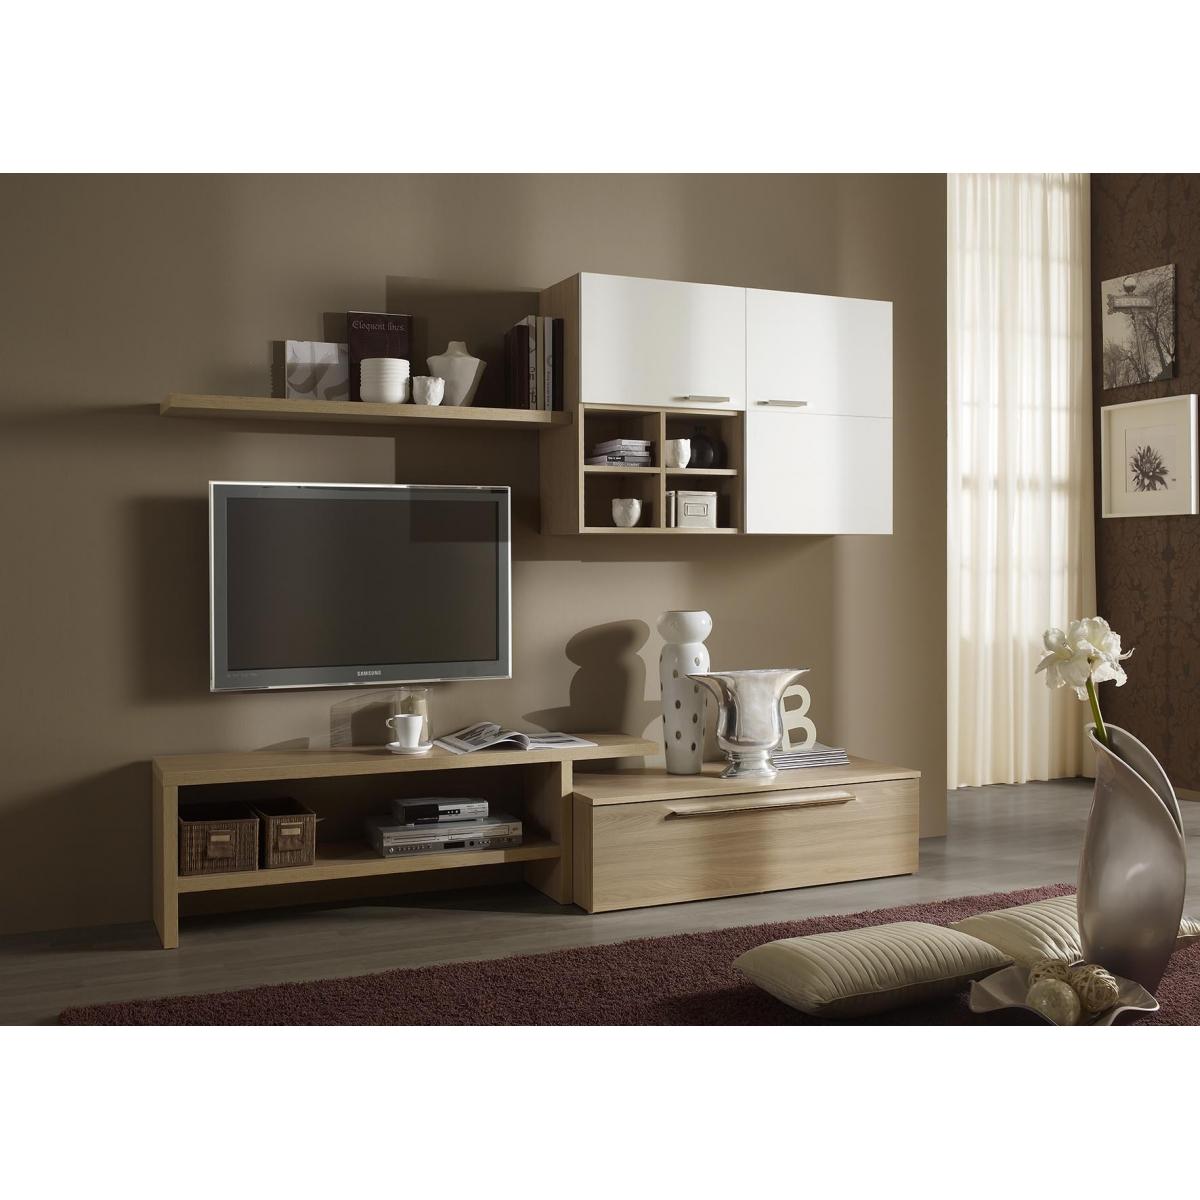 001 parete soggiorno moderno - Parete soggiorno moderno ...